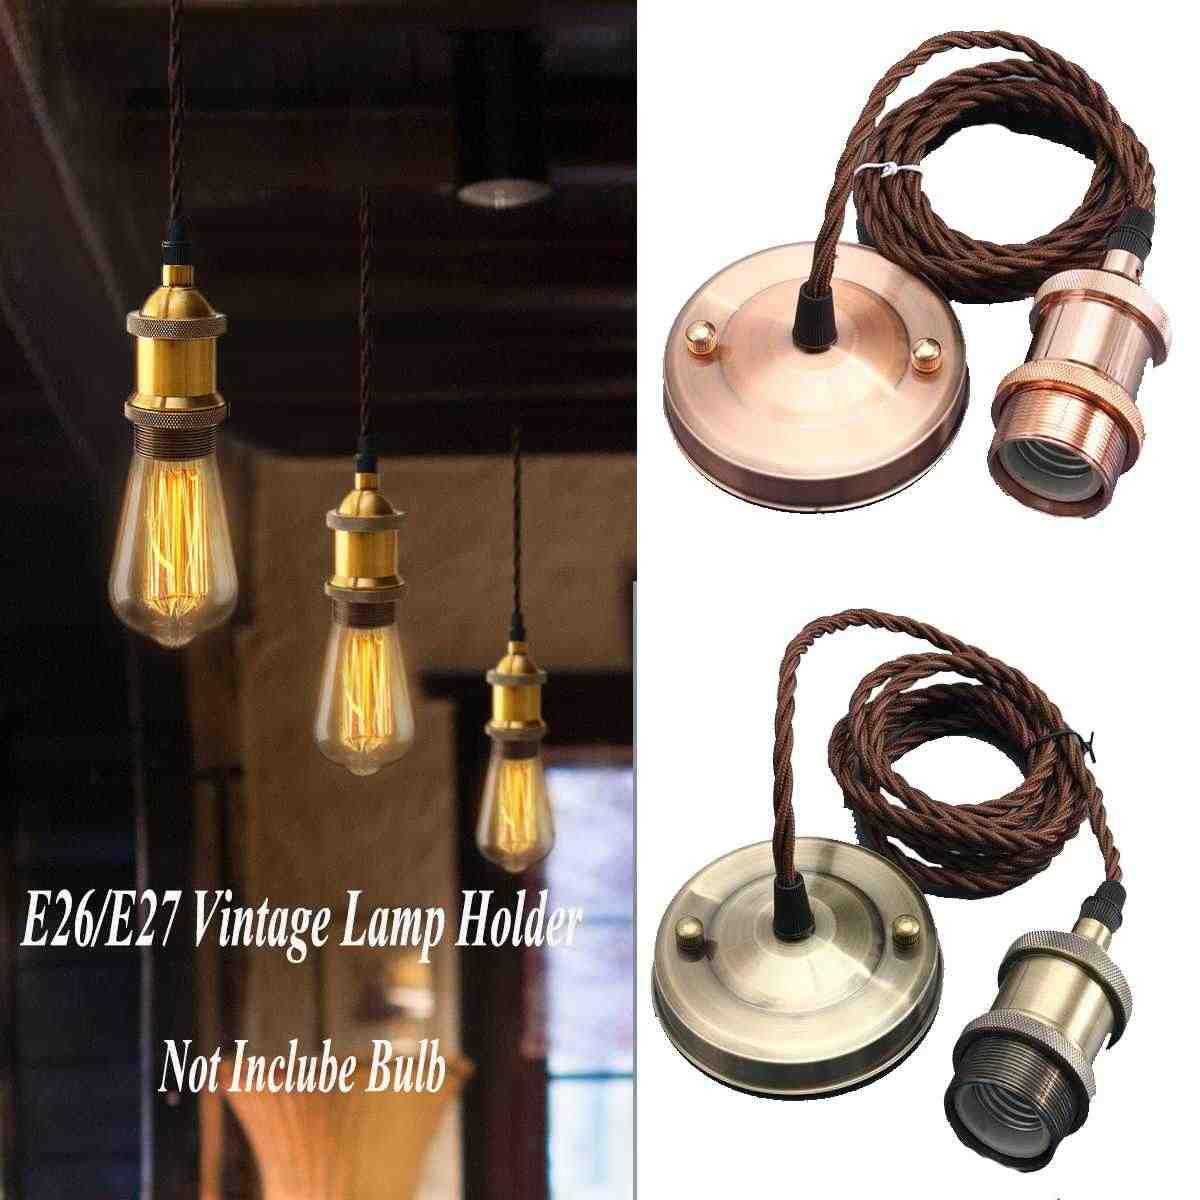 Vintage Style Lights Copper E27 Lamp Holder Socket 110V 220V Switch Screw chandelier Fitting e27 Lamp Bases With 2m wires